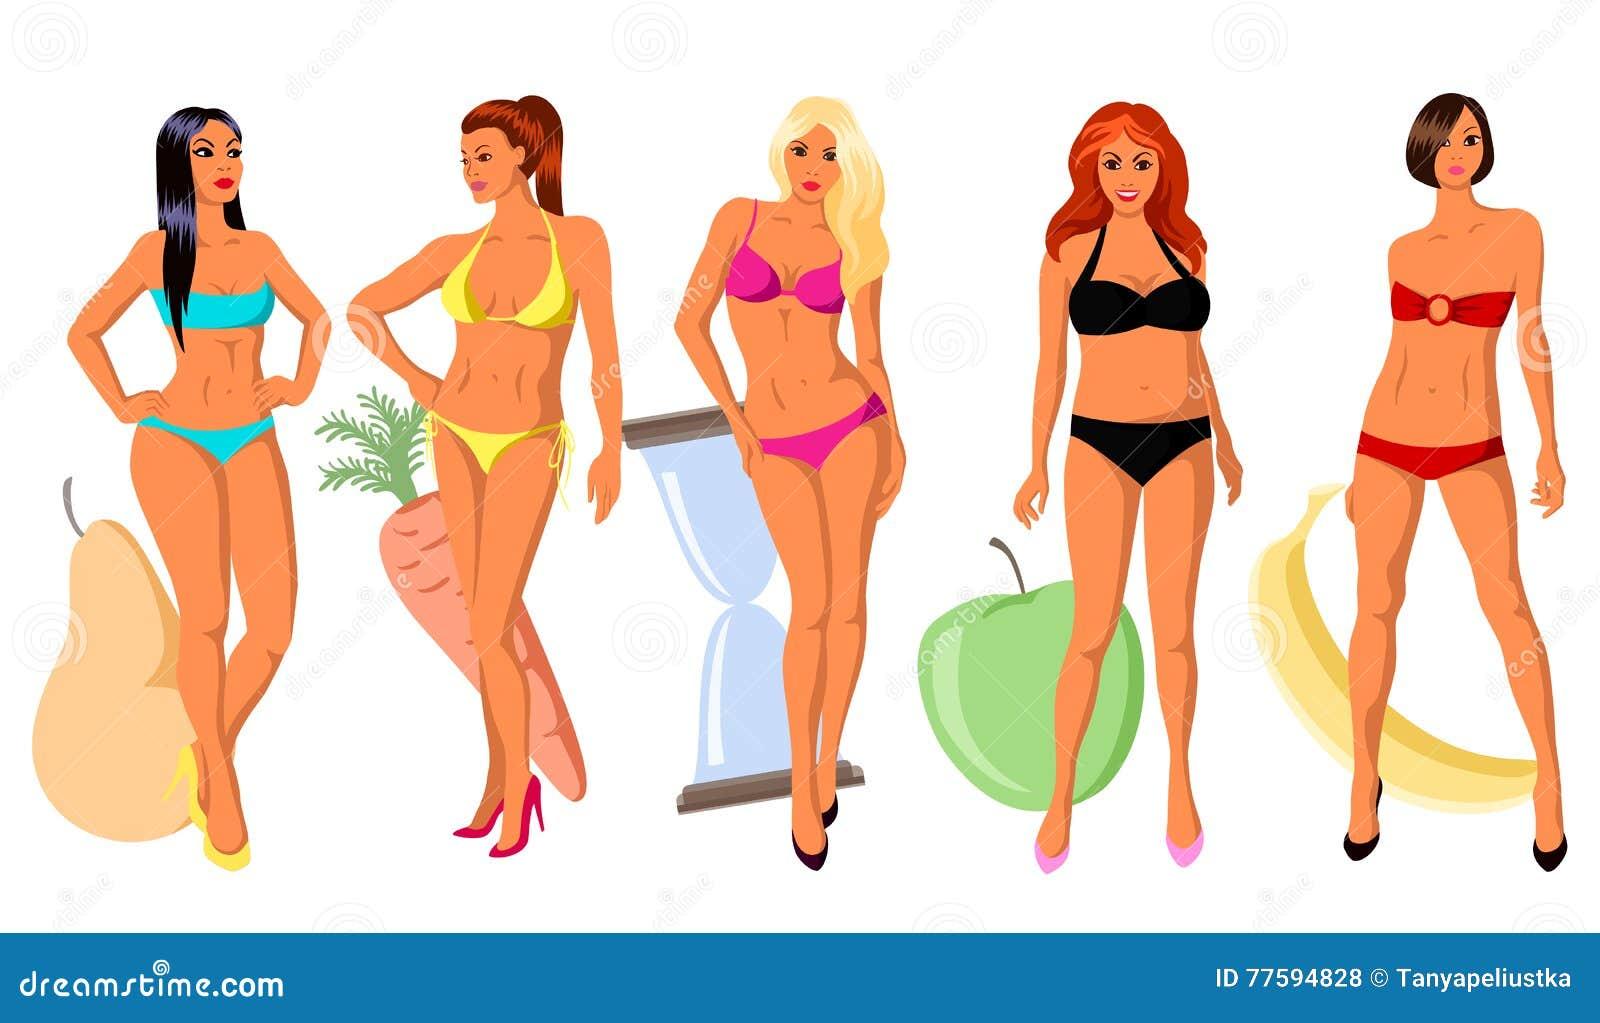 5 types of women's figure stock vector. Image of body ...